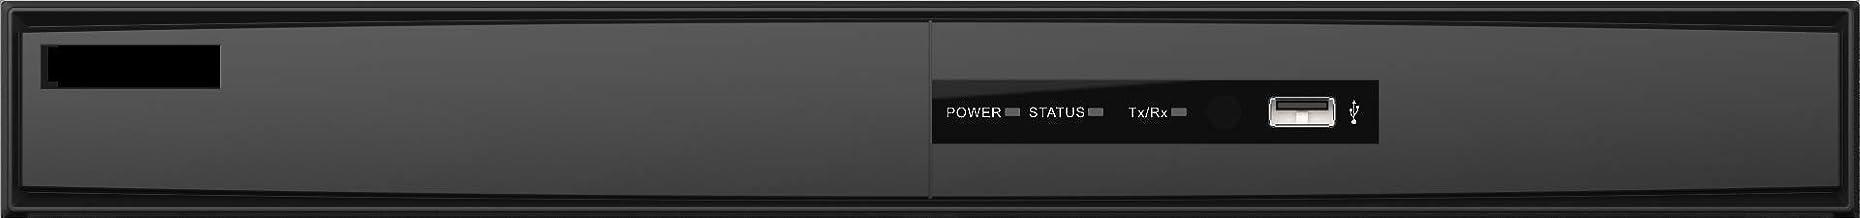 ENSECU 16 Channel HD-DVR + 8 Ch Onvif IP 6MP (HDTVI/HDCVI/AHD/ 960H), Hikvision OEM DS-7216HQHI-K2, HD Turbo, HDMI 4K Video Output, Audio, Surge Protection, HKTek, No Logo